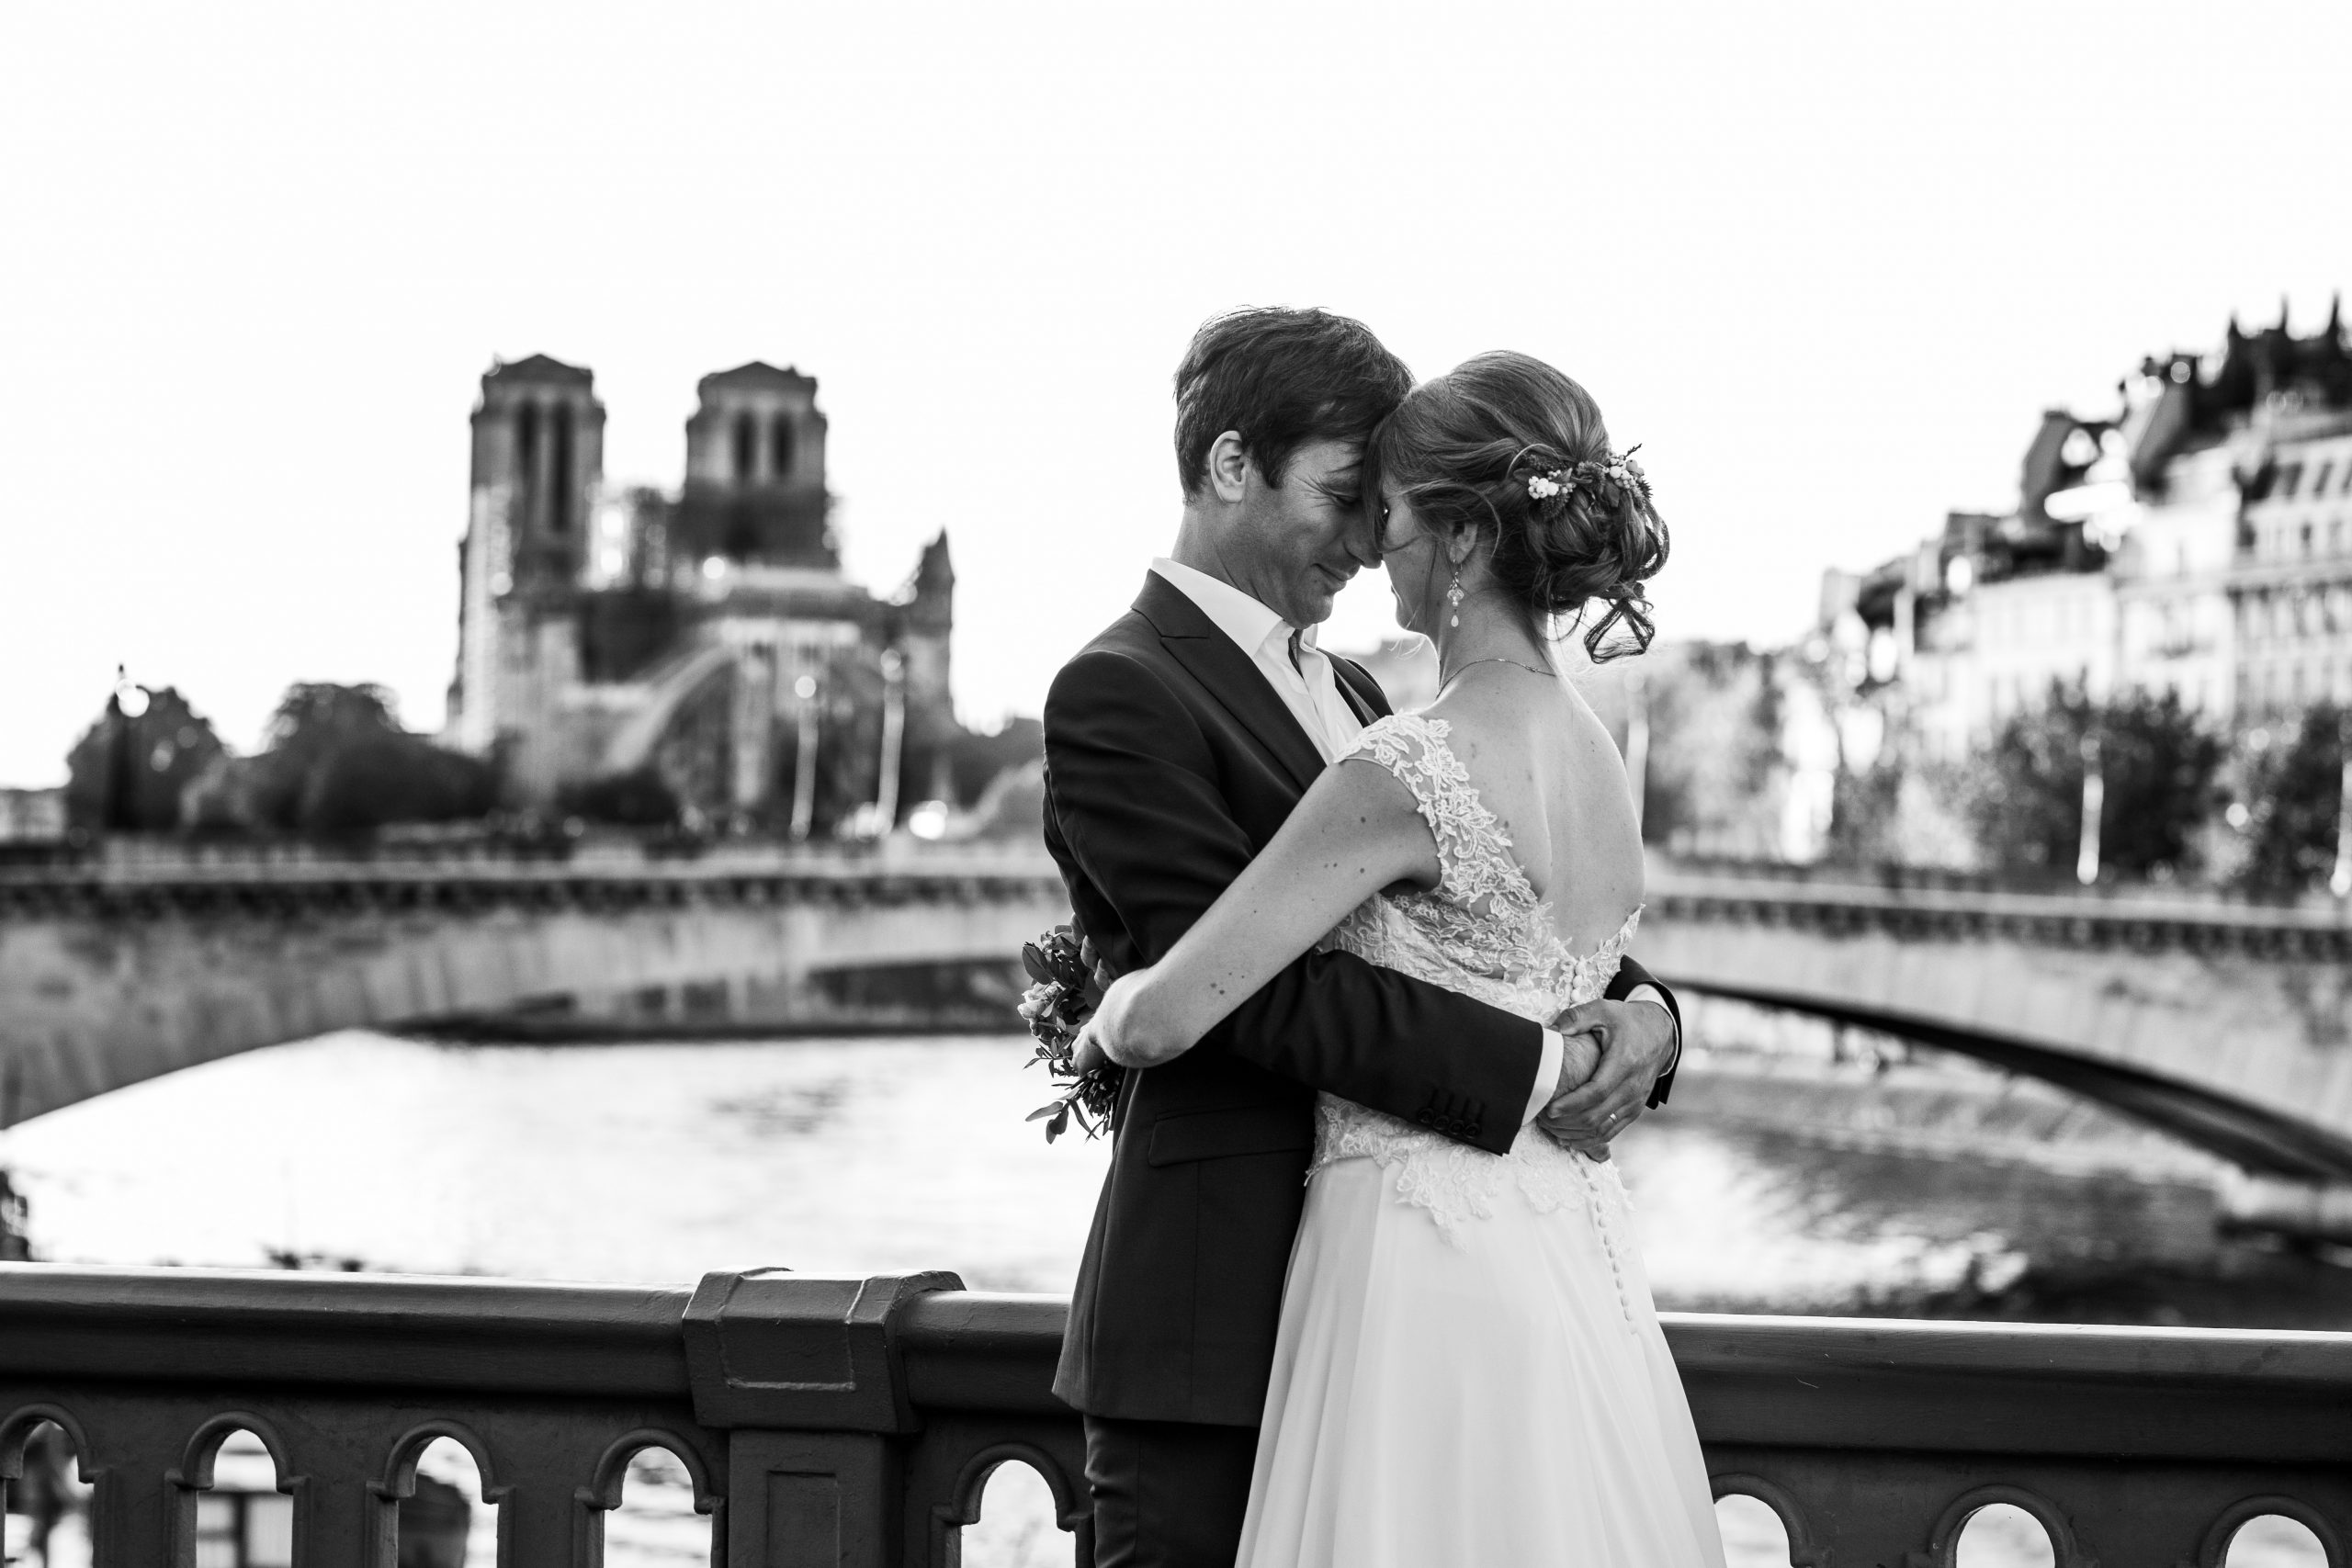 Photographie mariage - Photographe mariage - Paris- Montpellier - Nice - original - Mariage Pont parisien - Mariage Seine - Paris